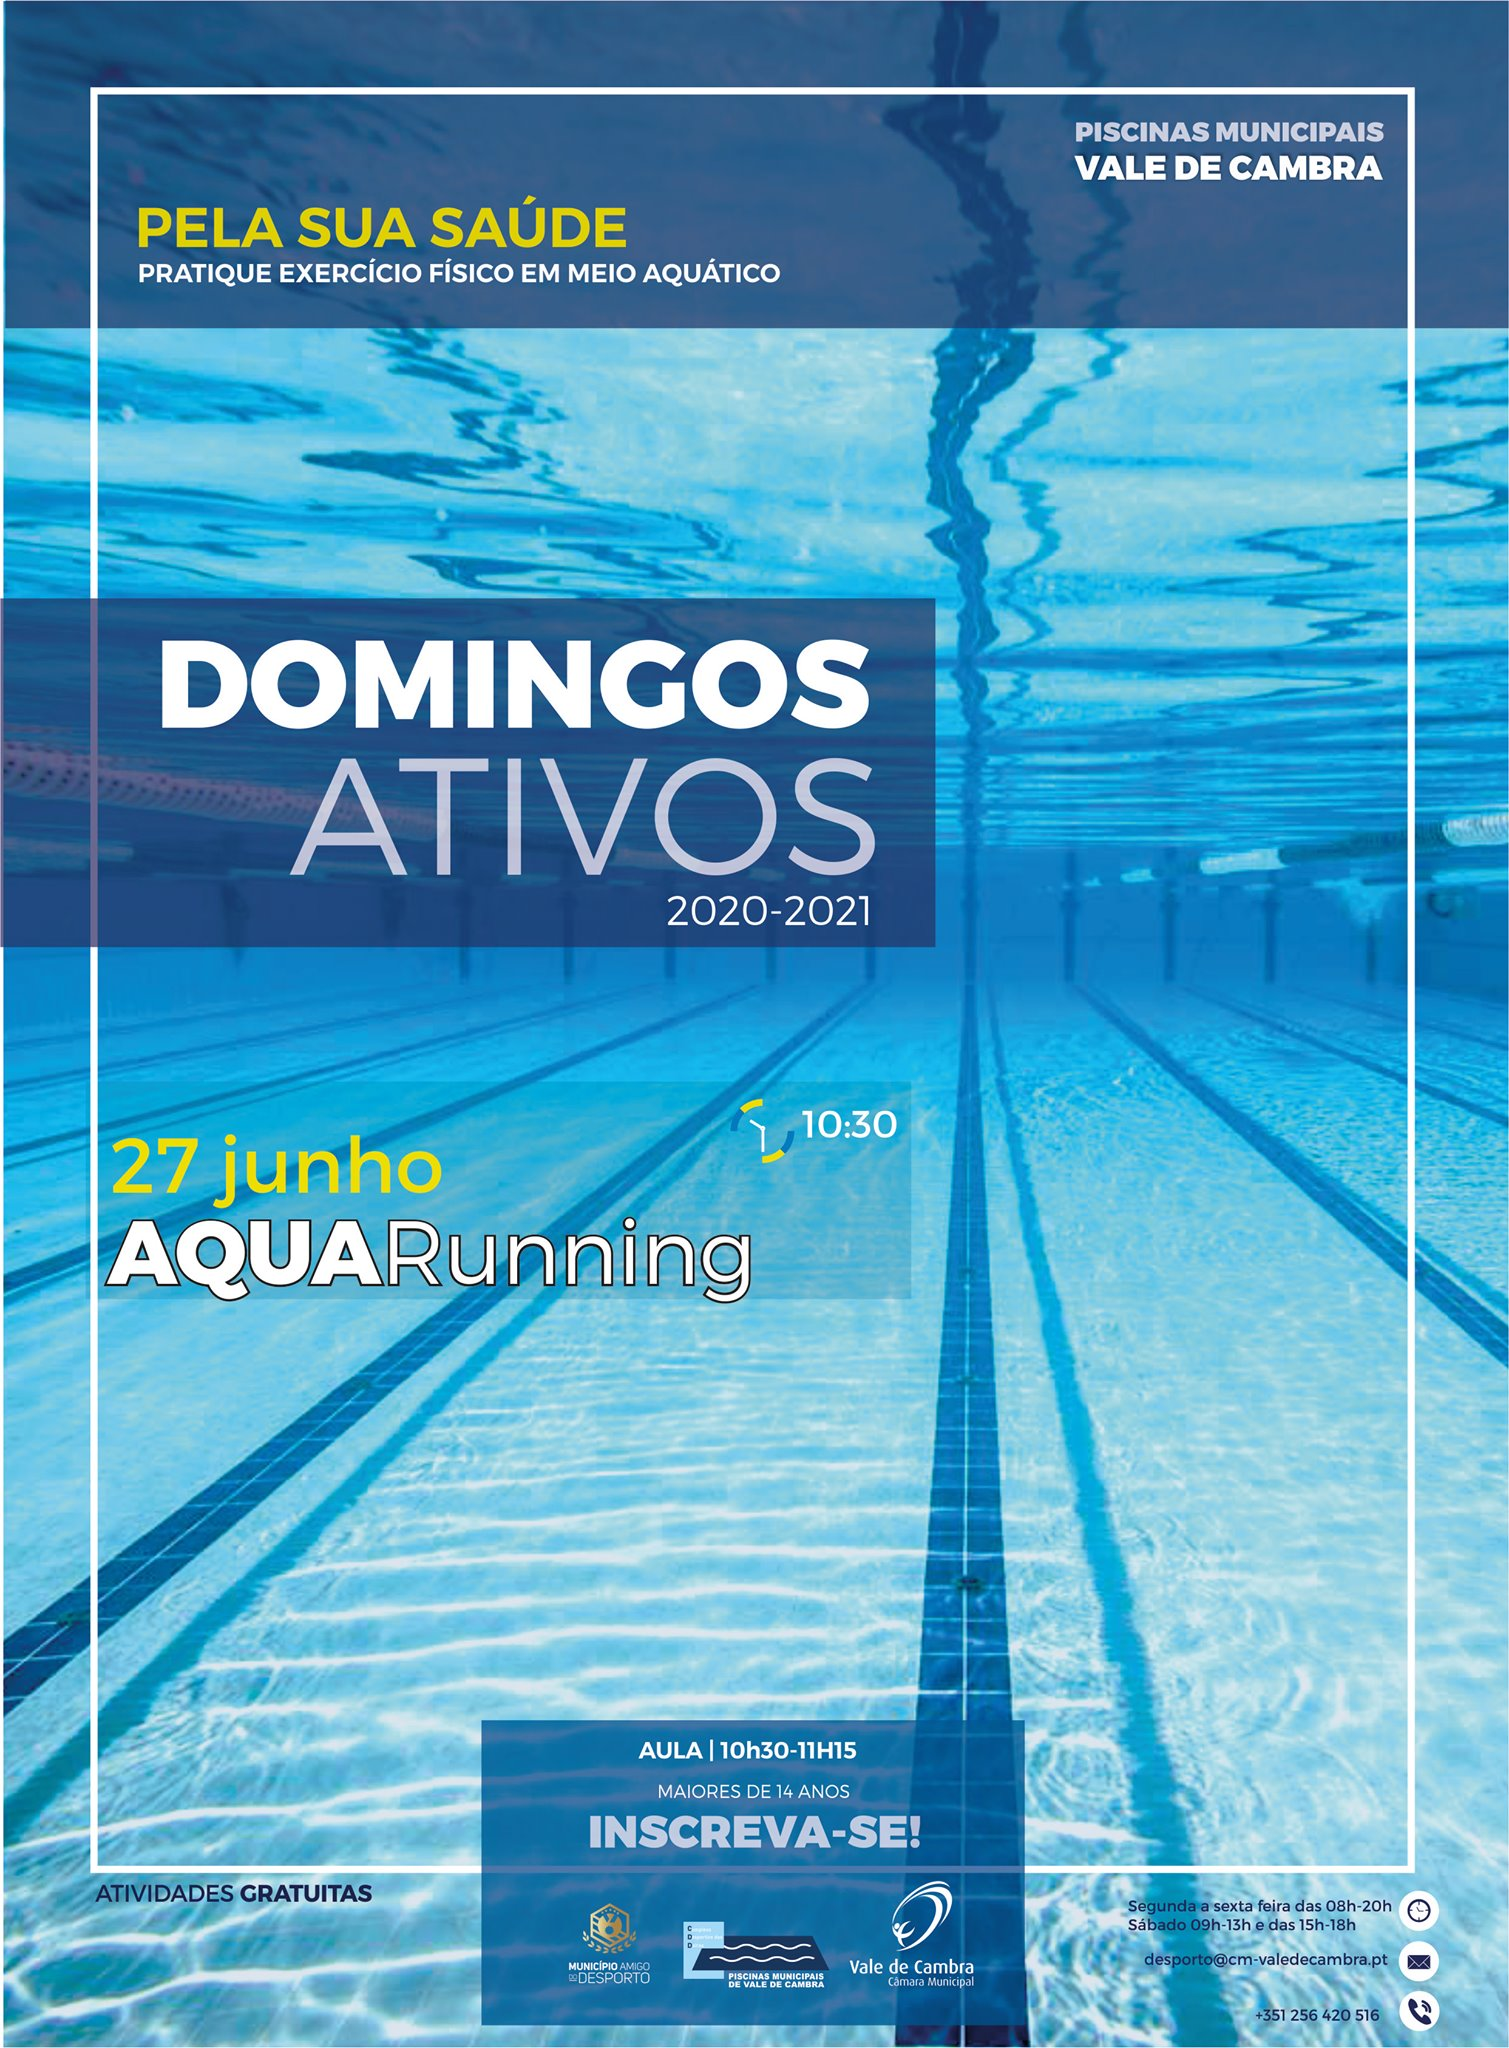 Domingos Ativos: AquaRunning